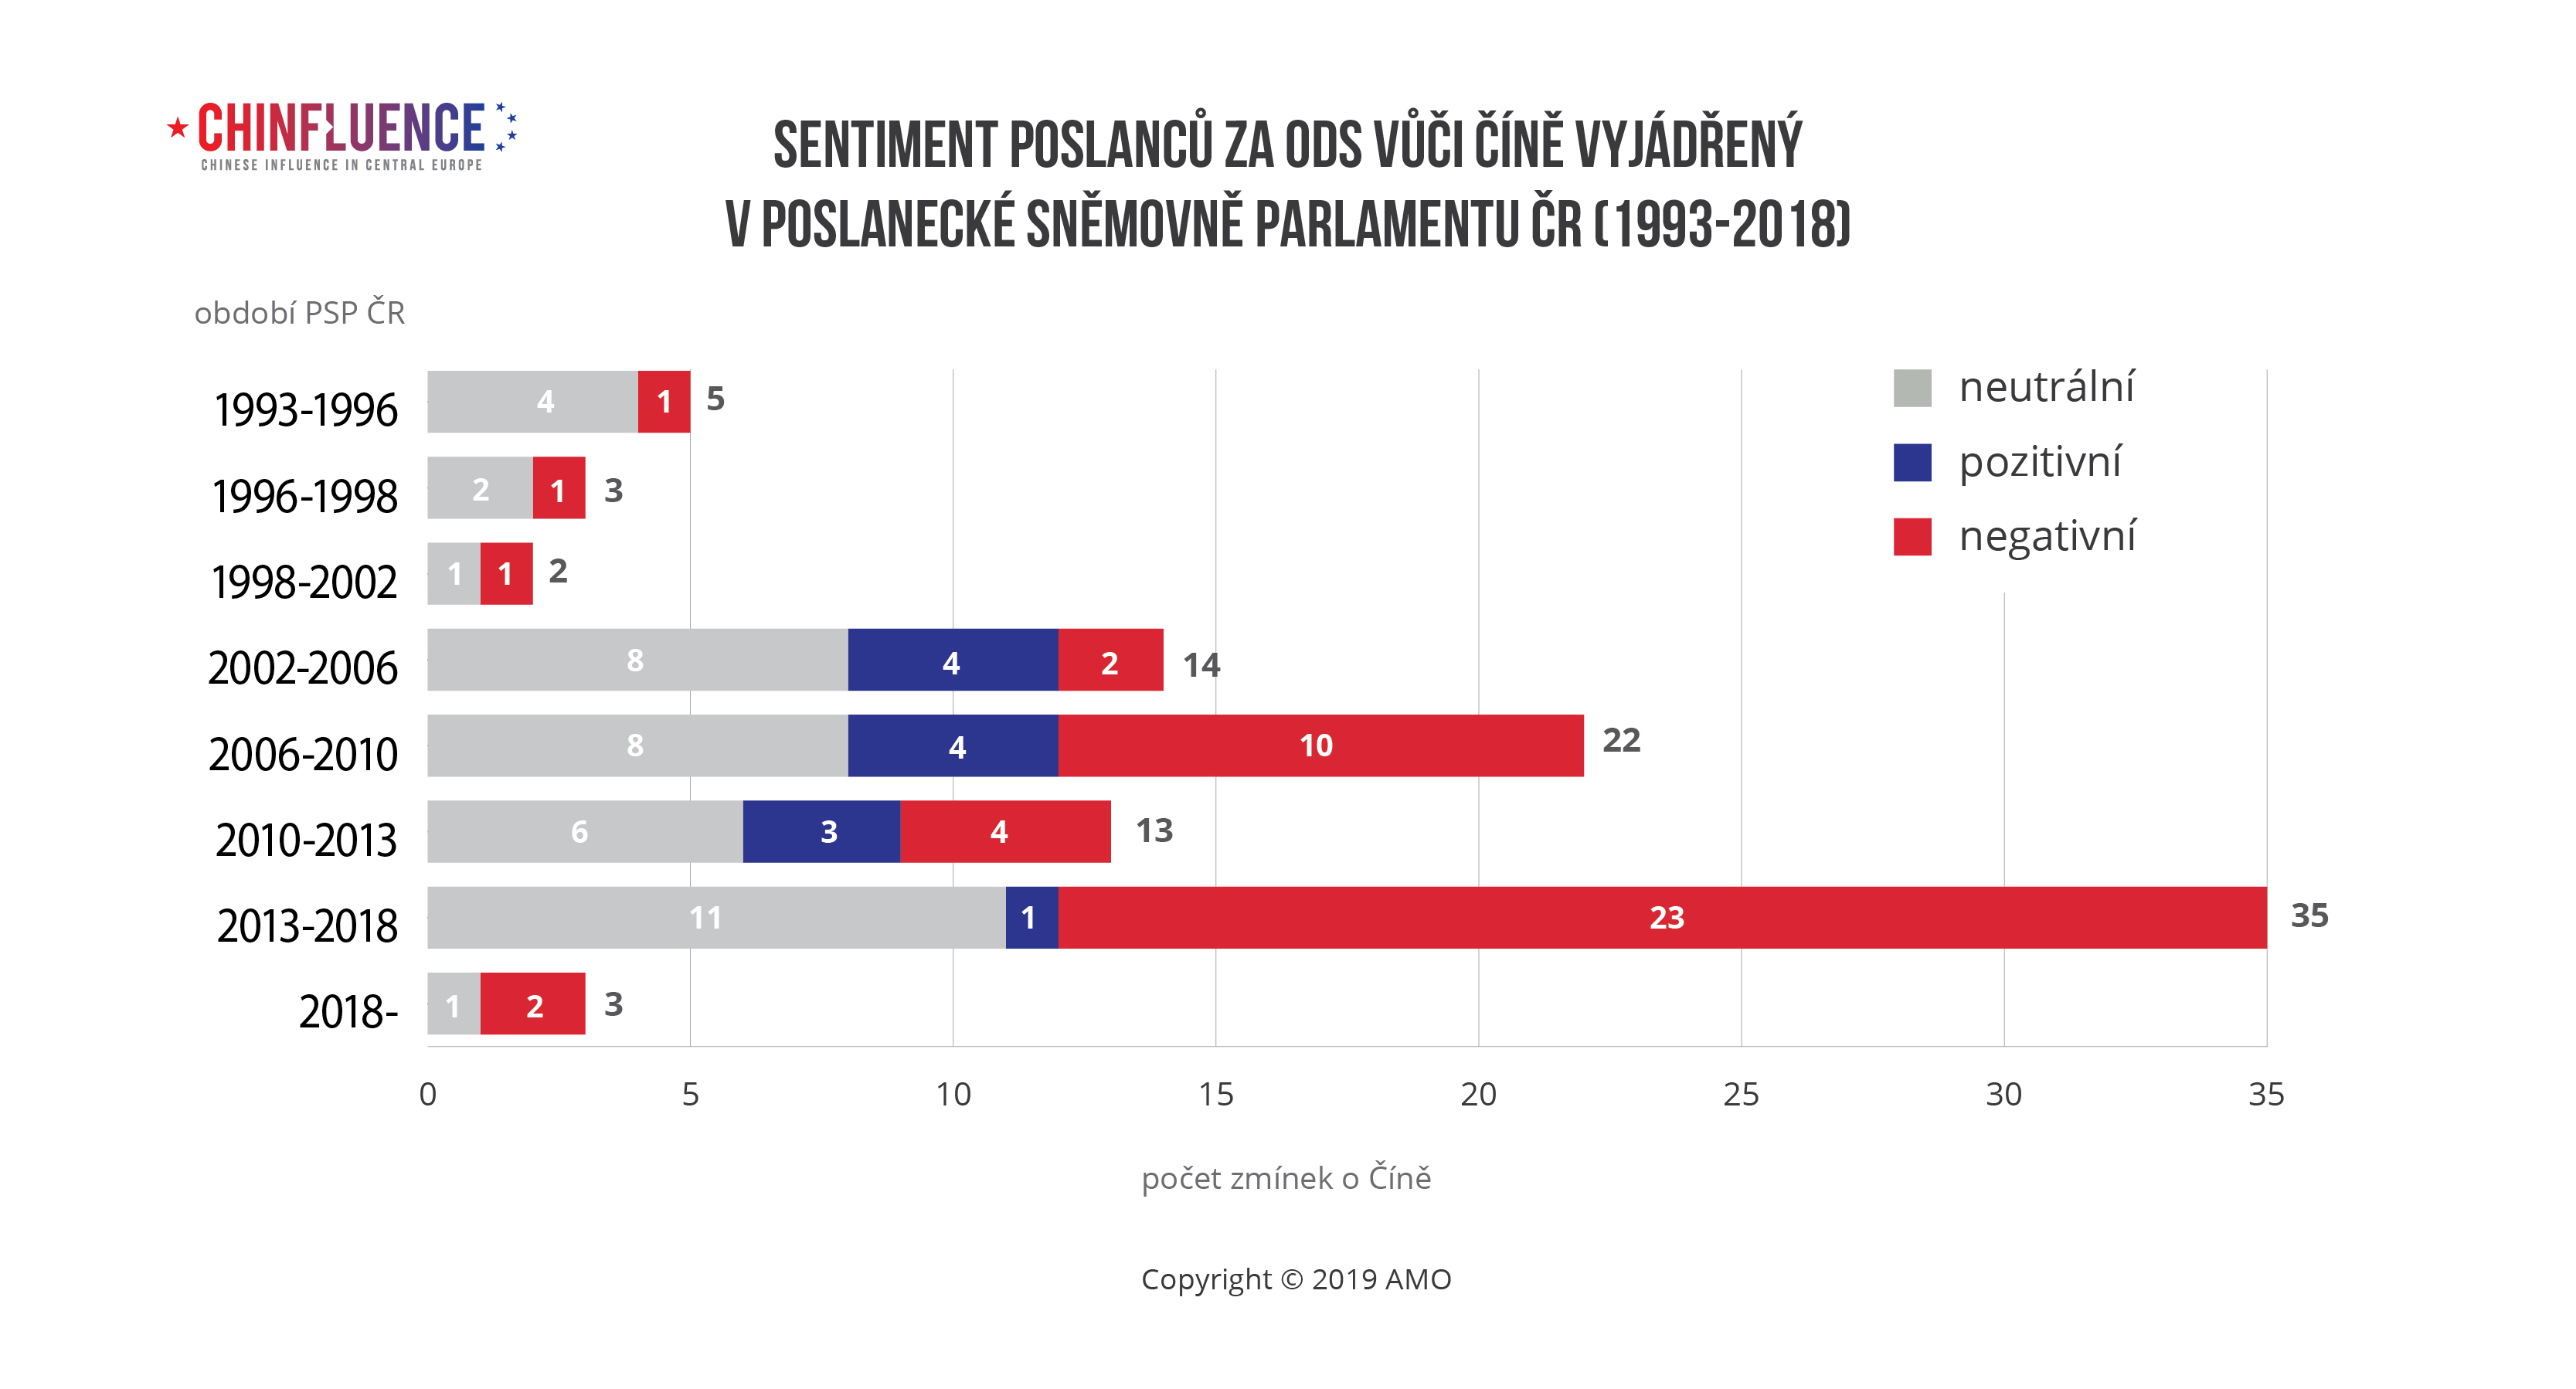 Sentiment poslancu za ODS vuci Cine vyjadreny v Poslanecke snemovne Parlamentu CR-1993-2018